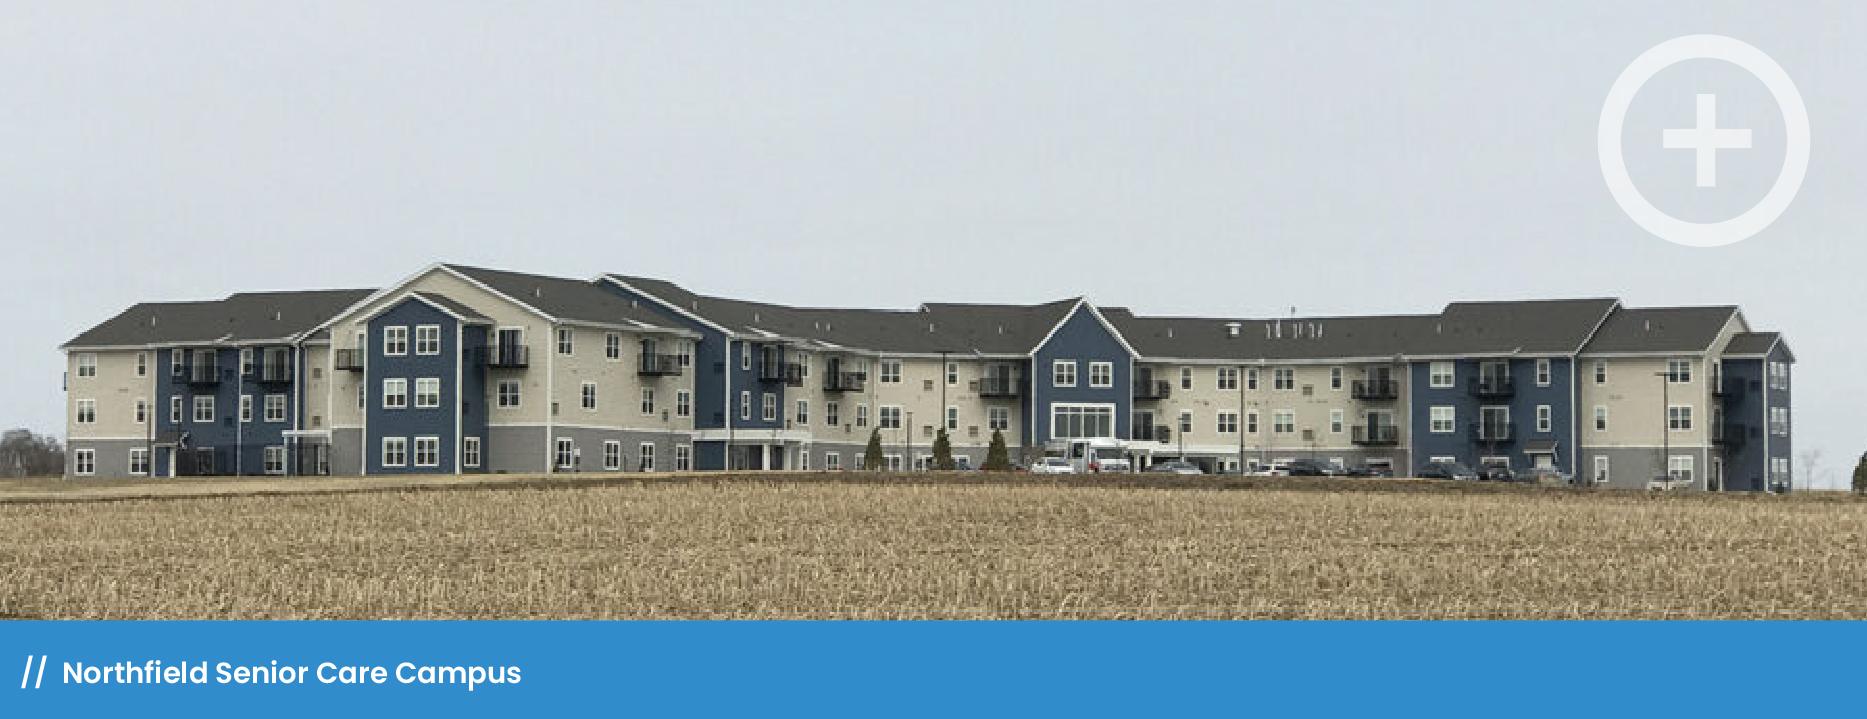 Yanik-Watermark_Northfield Senior Care Campus-